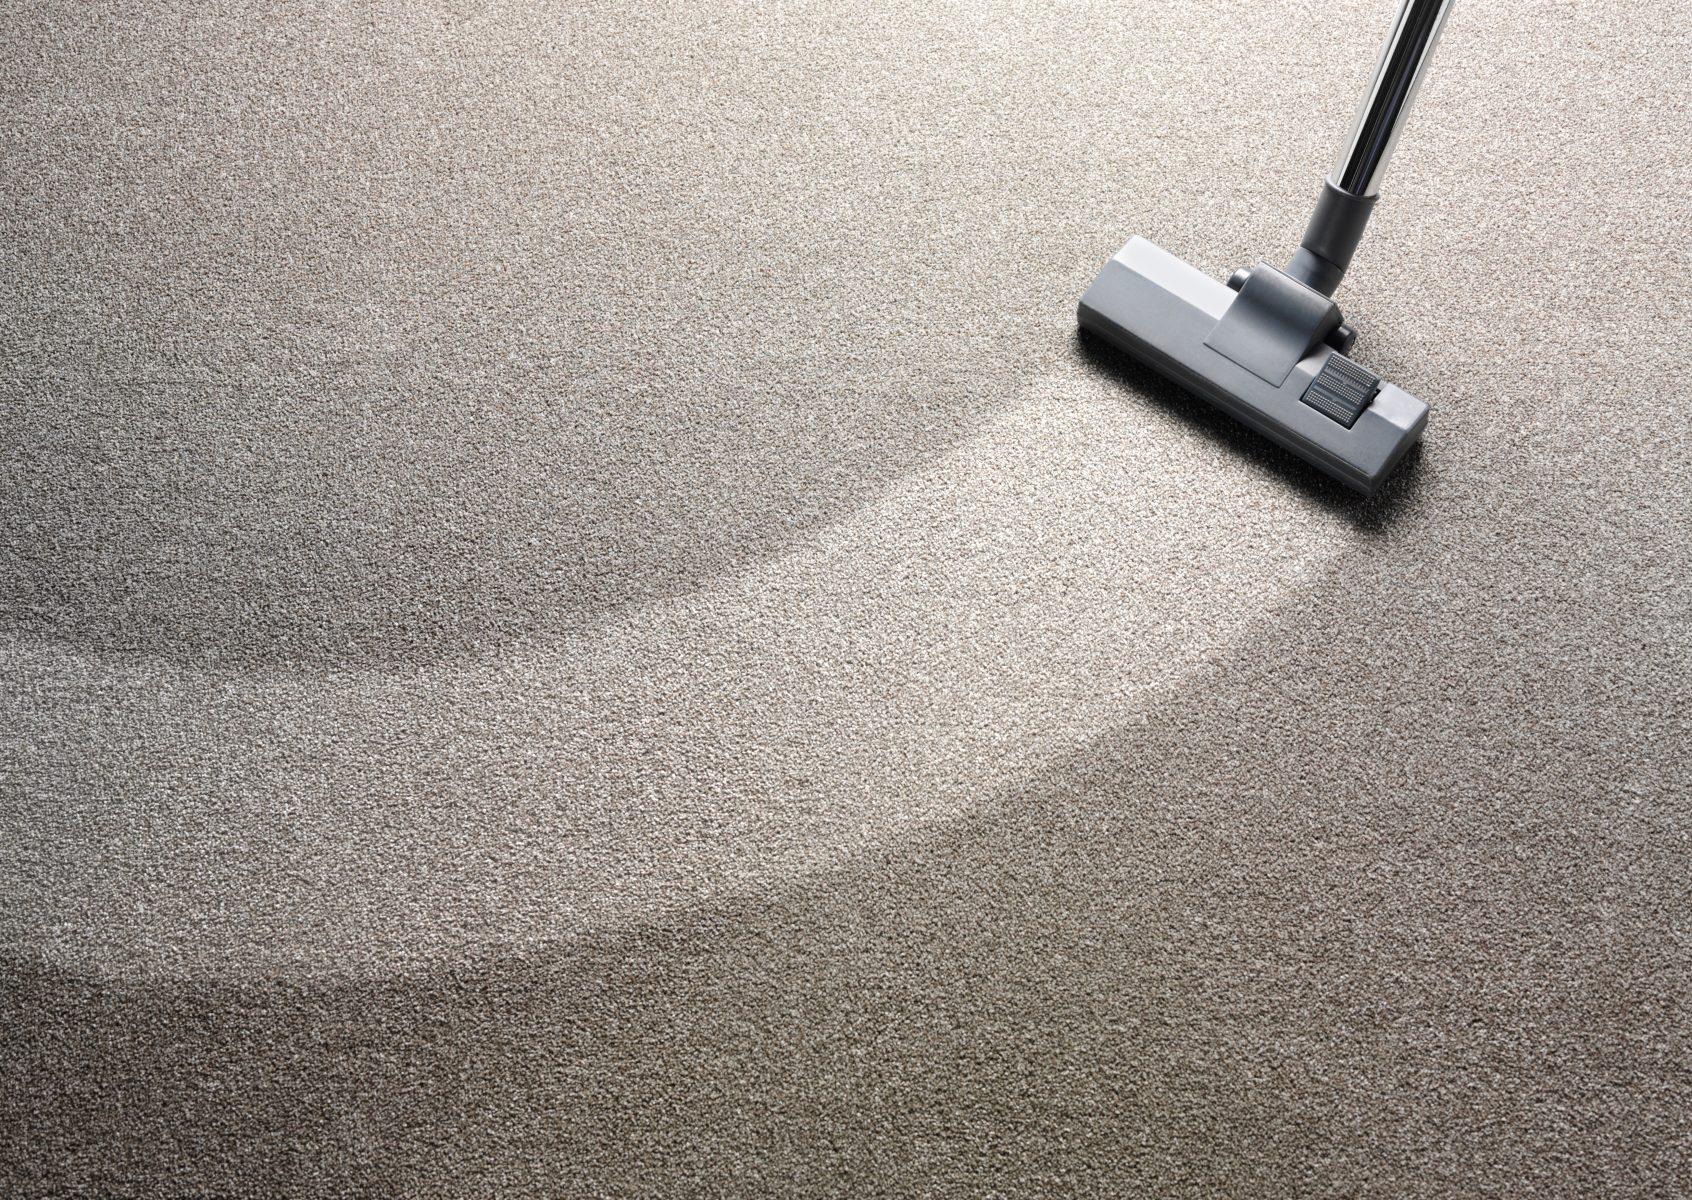 hwo to dry wet carpet